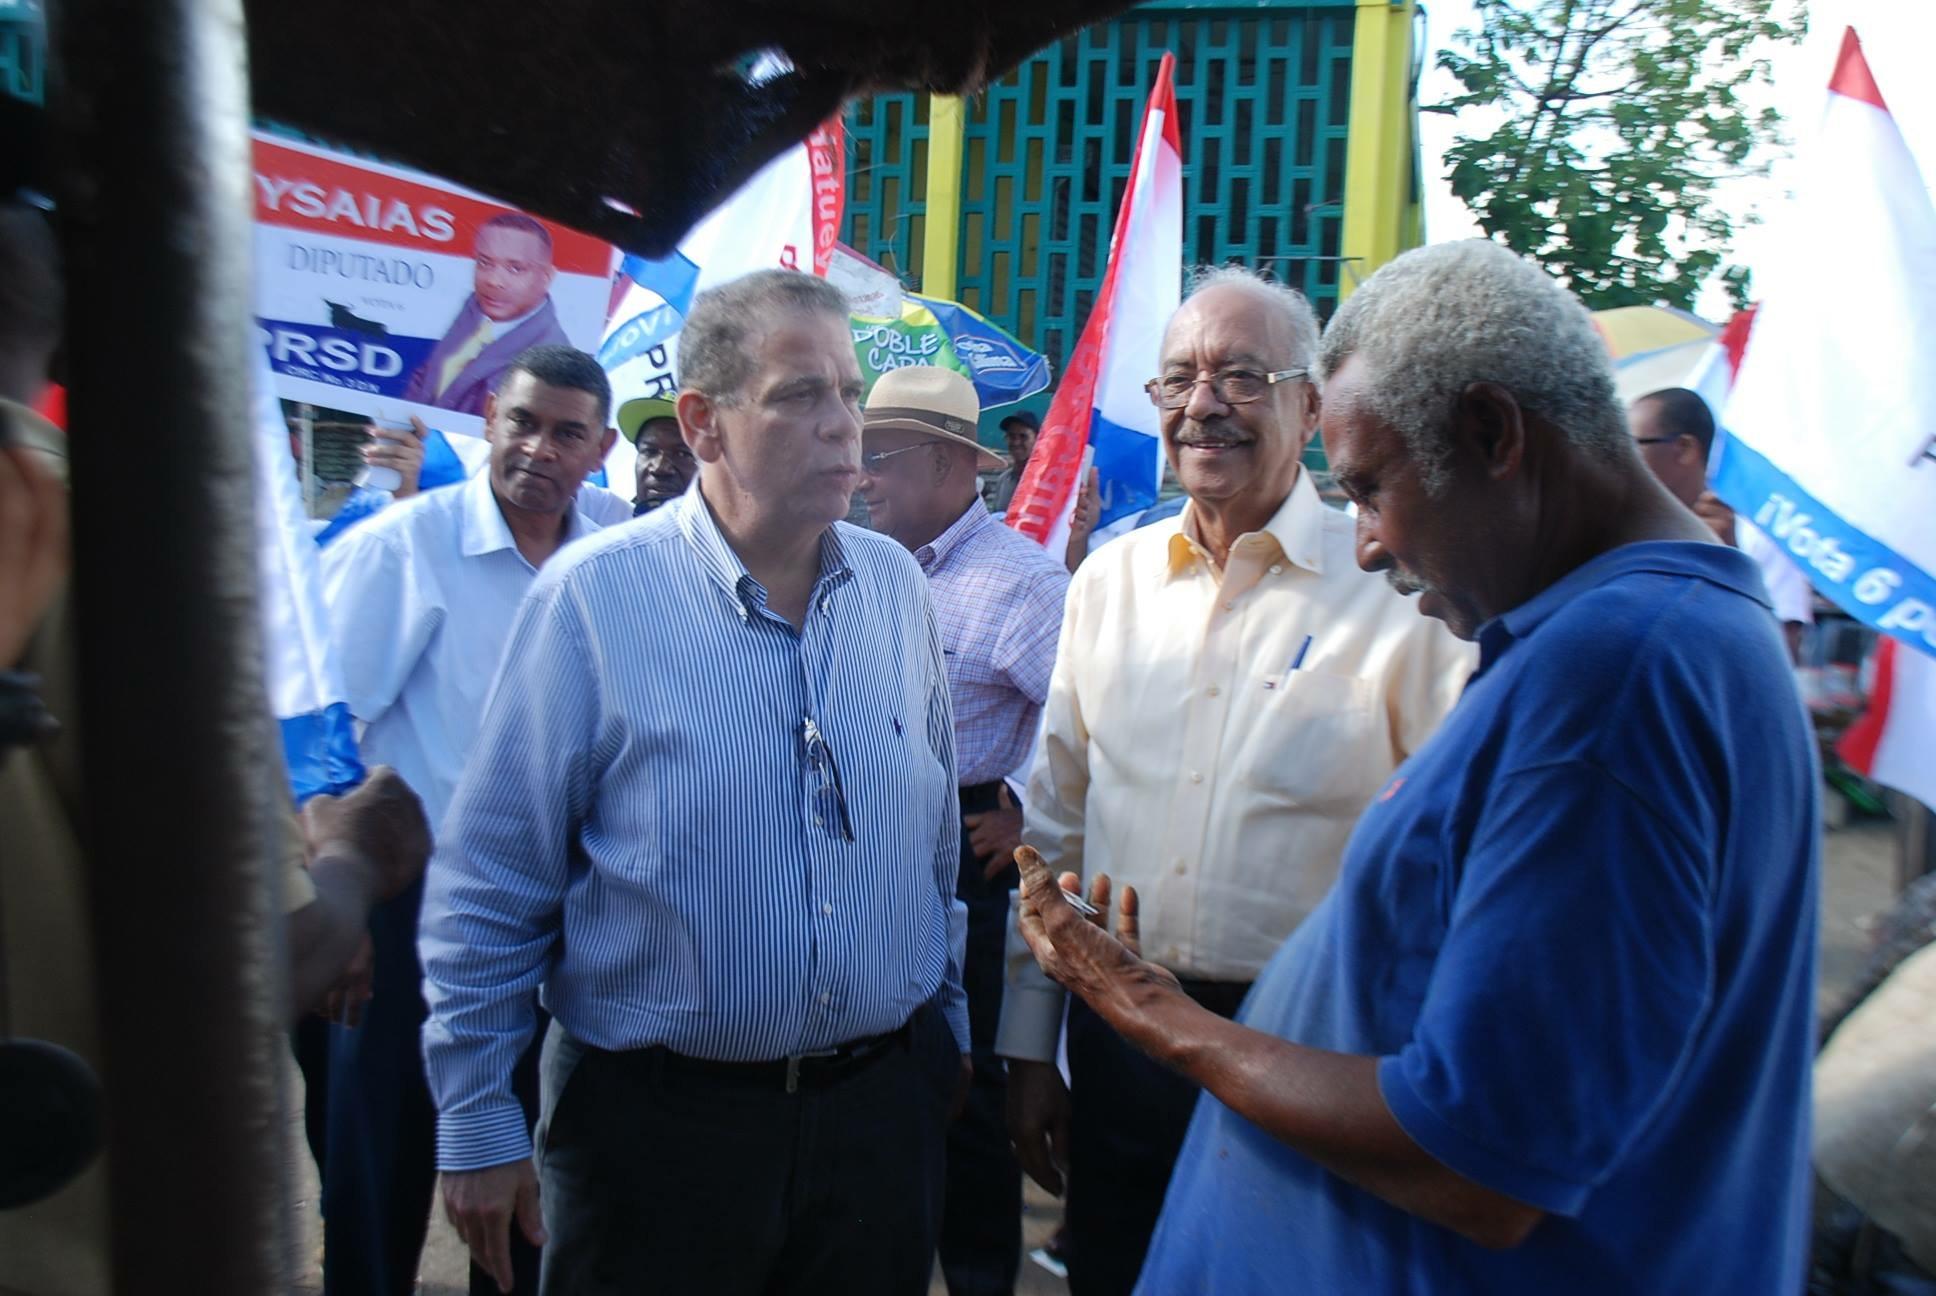 Candidato a alcalde PRSD deplora abandono mercados del DN